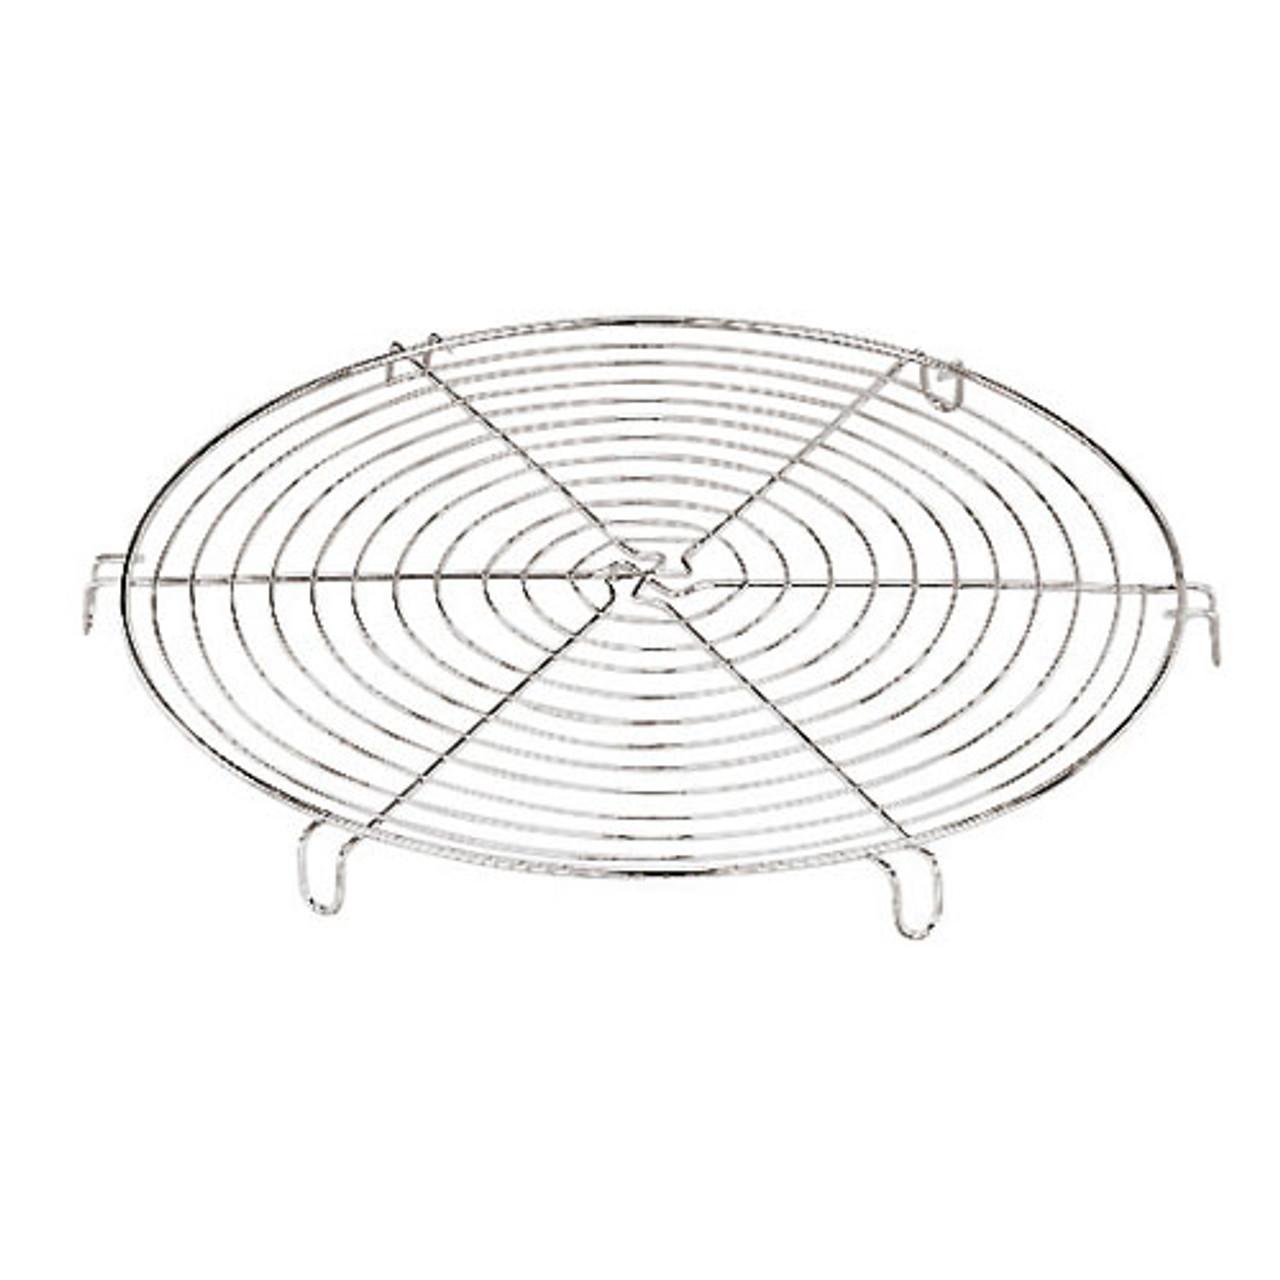 "Round Cooling Rack,Chromed, 10 1/4"", L 10.25 x W 10.25 x H 1"